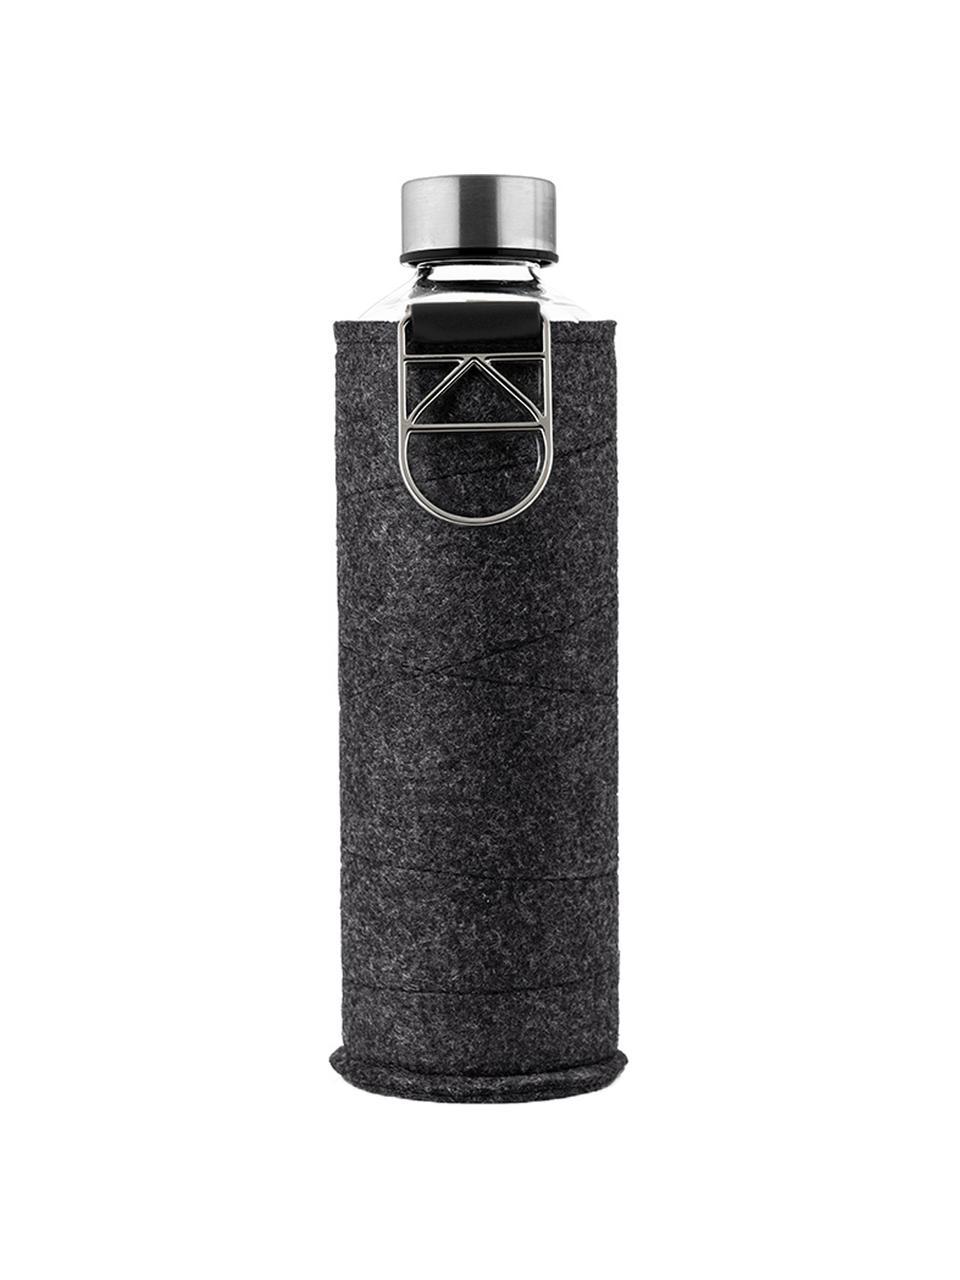 Trinkflasche Mismatch, Flasche: Borosilikatglas, Deckel: Edelstahl, Tritan, Siliko, Bezug: Polyesterfilz, Schwarz, Transparent, Silberfarben, Ø 8 x H 26 cm